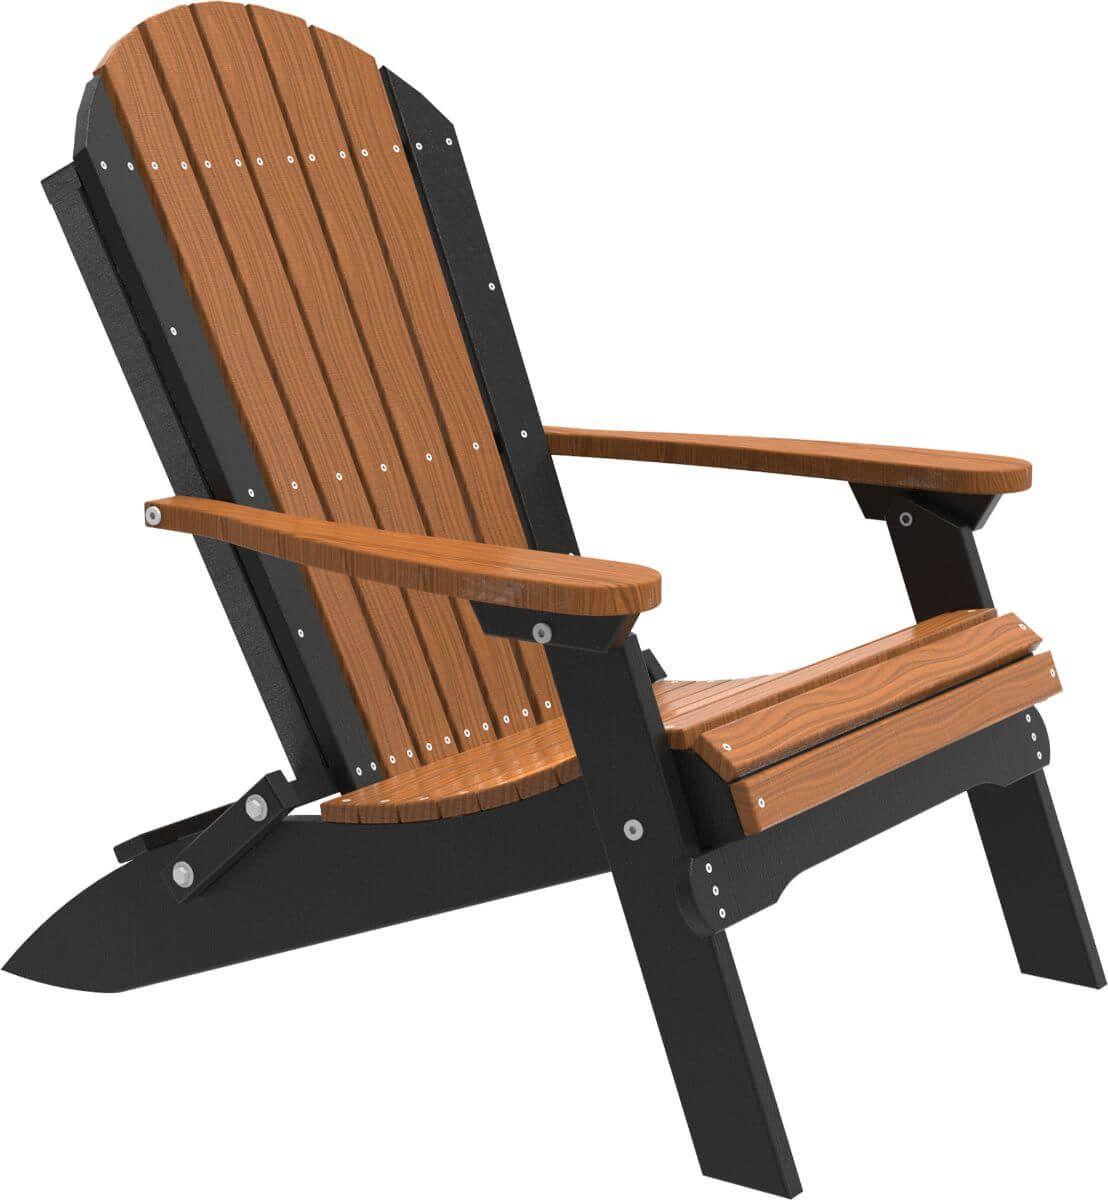 Antique Mahogany and Black Tahiti Folding Adirondack Chair